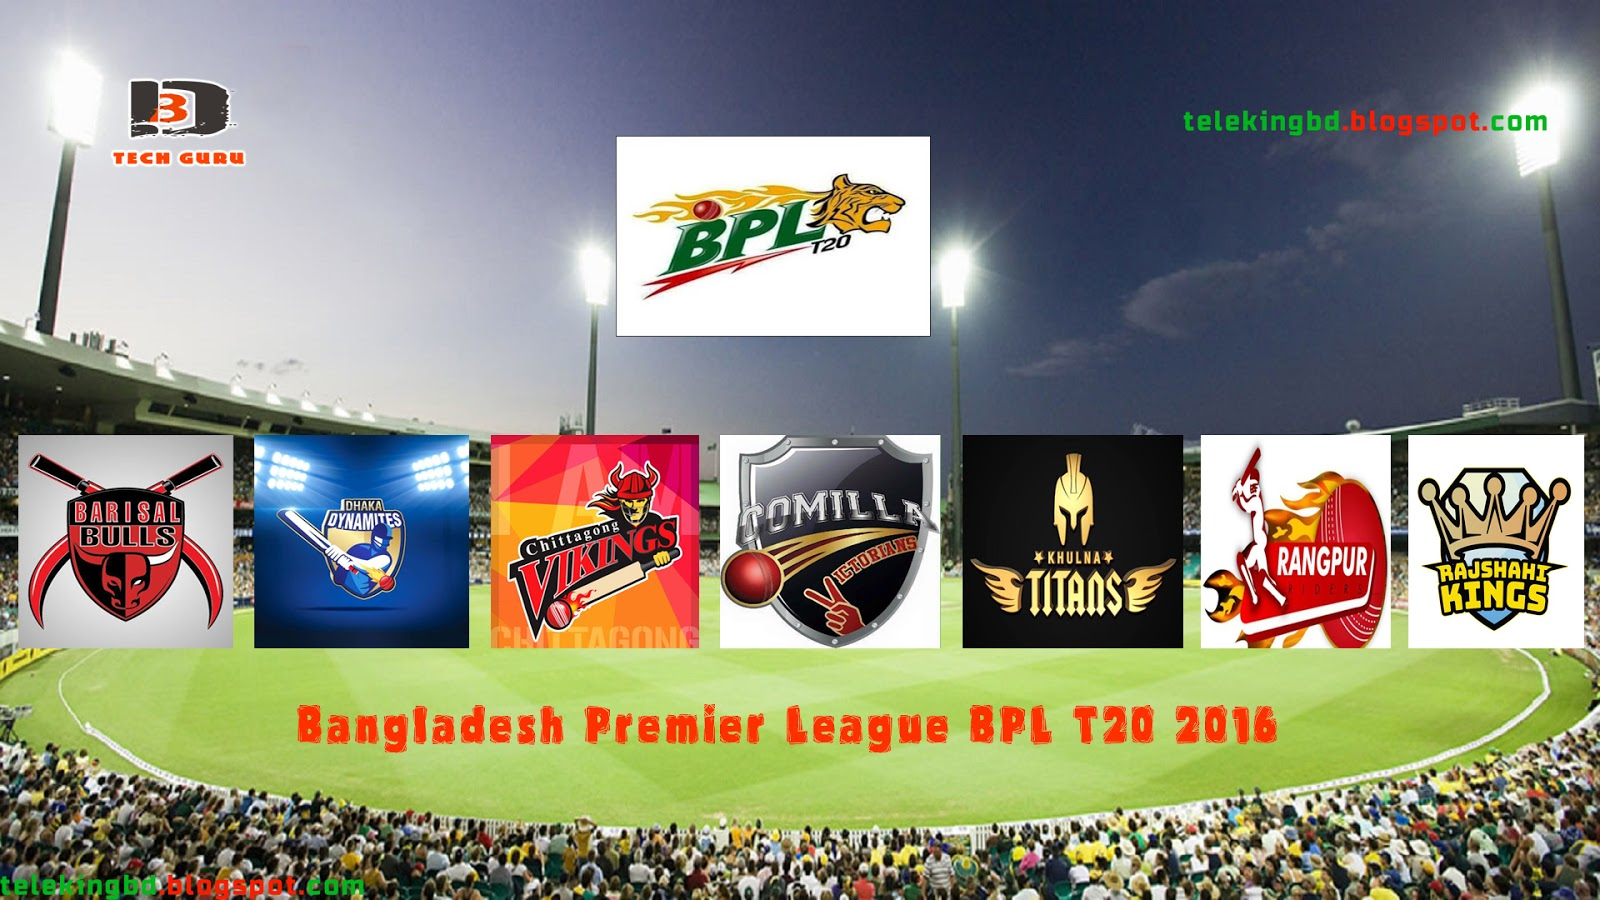 Bangladesh Premier League Bpl T20 2016 Channel 9 Live Match Streaming